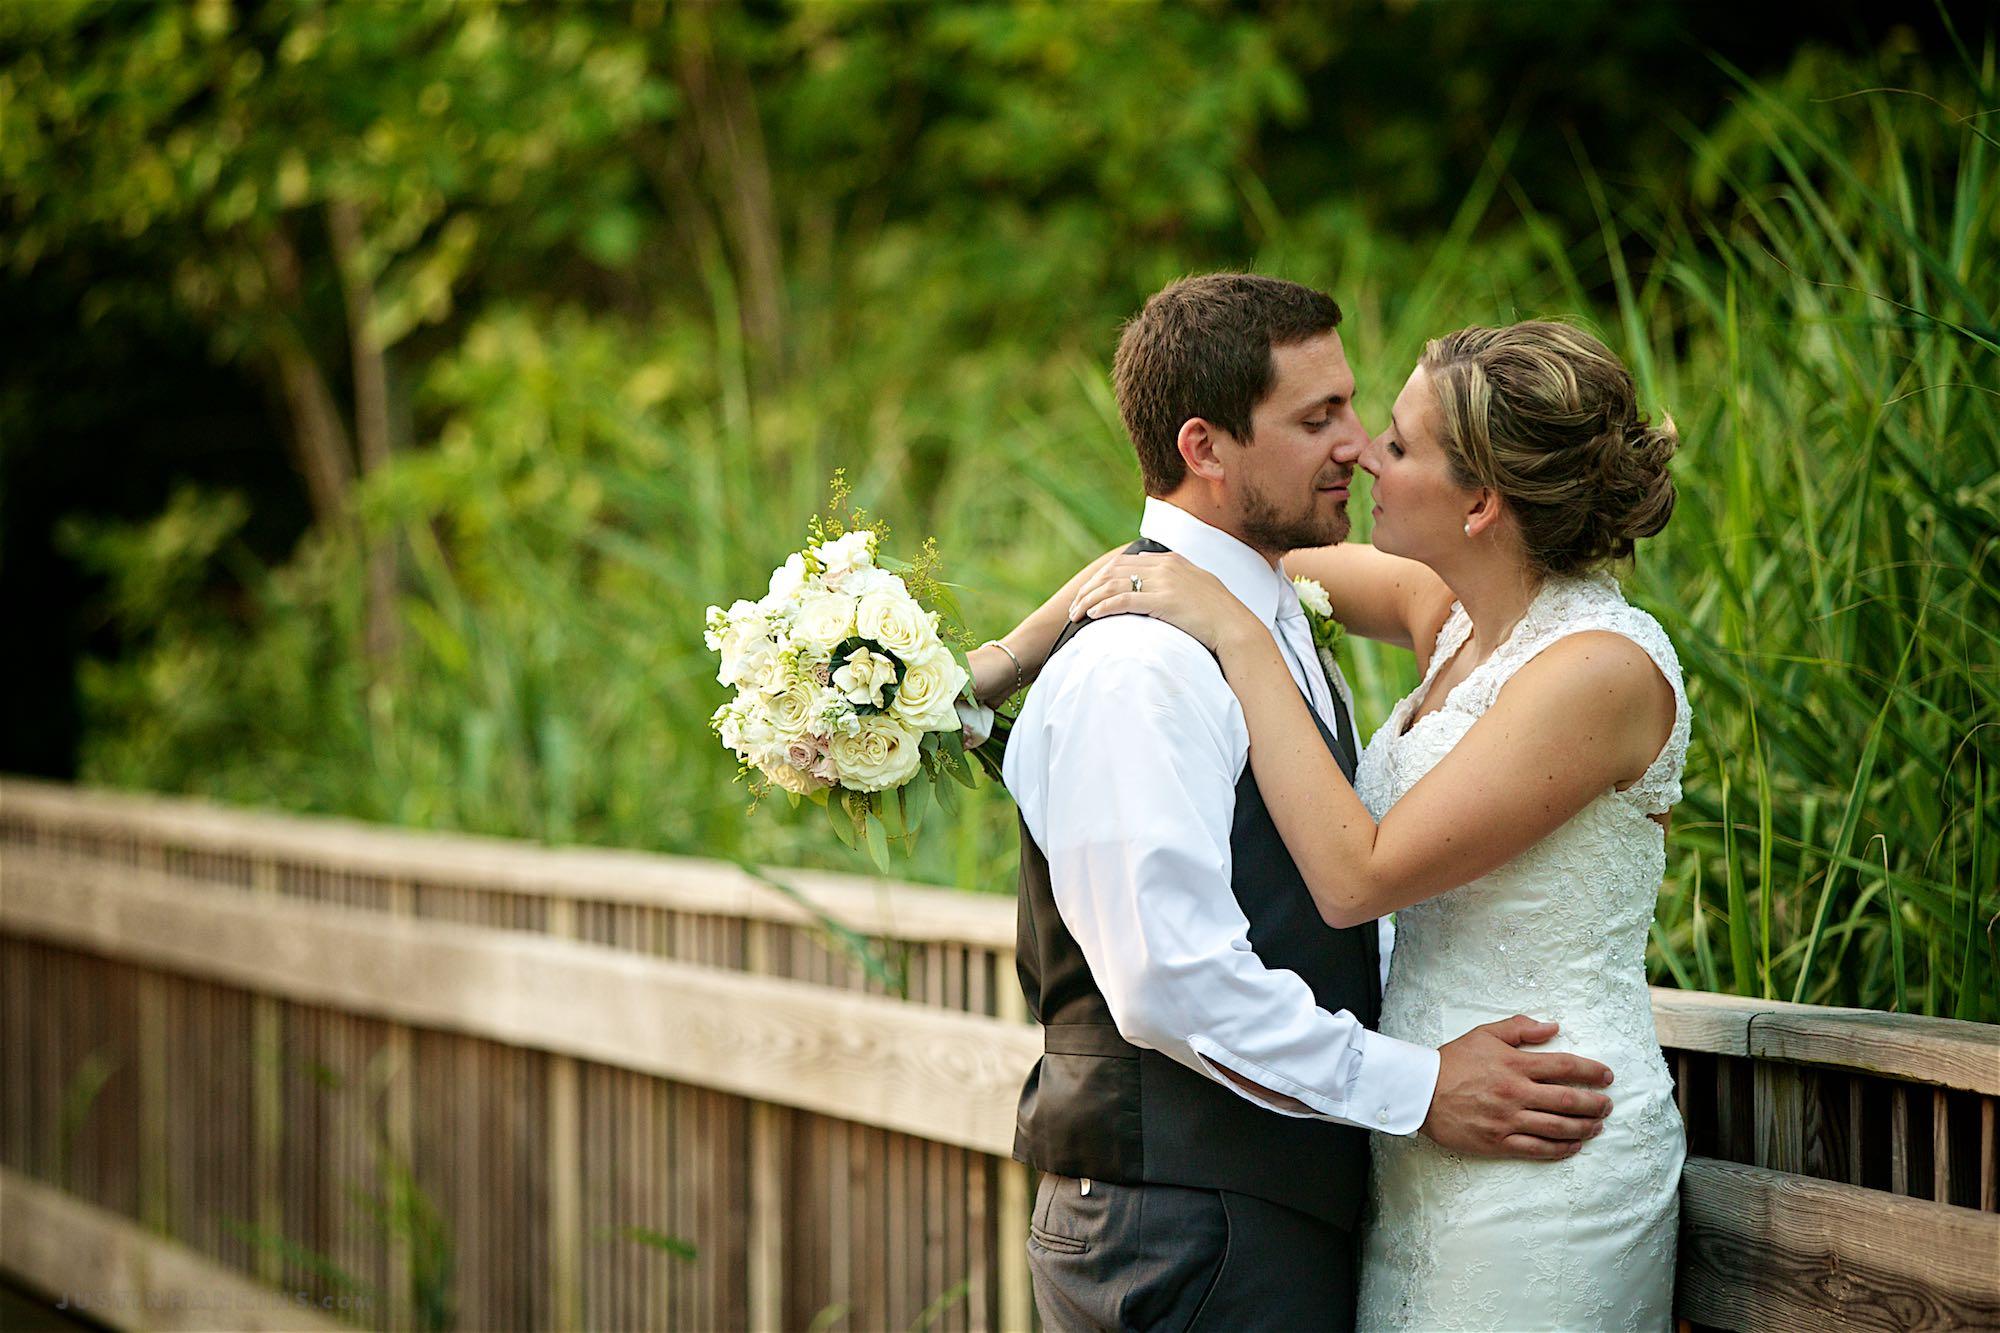 Hilton Garden Inn Virginia Beach Oceanfront Wedding - Haley & Jake